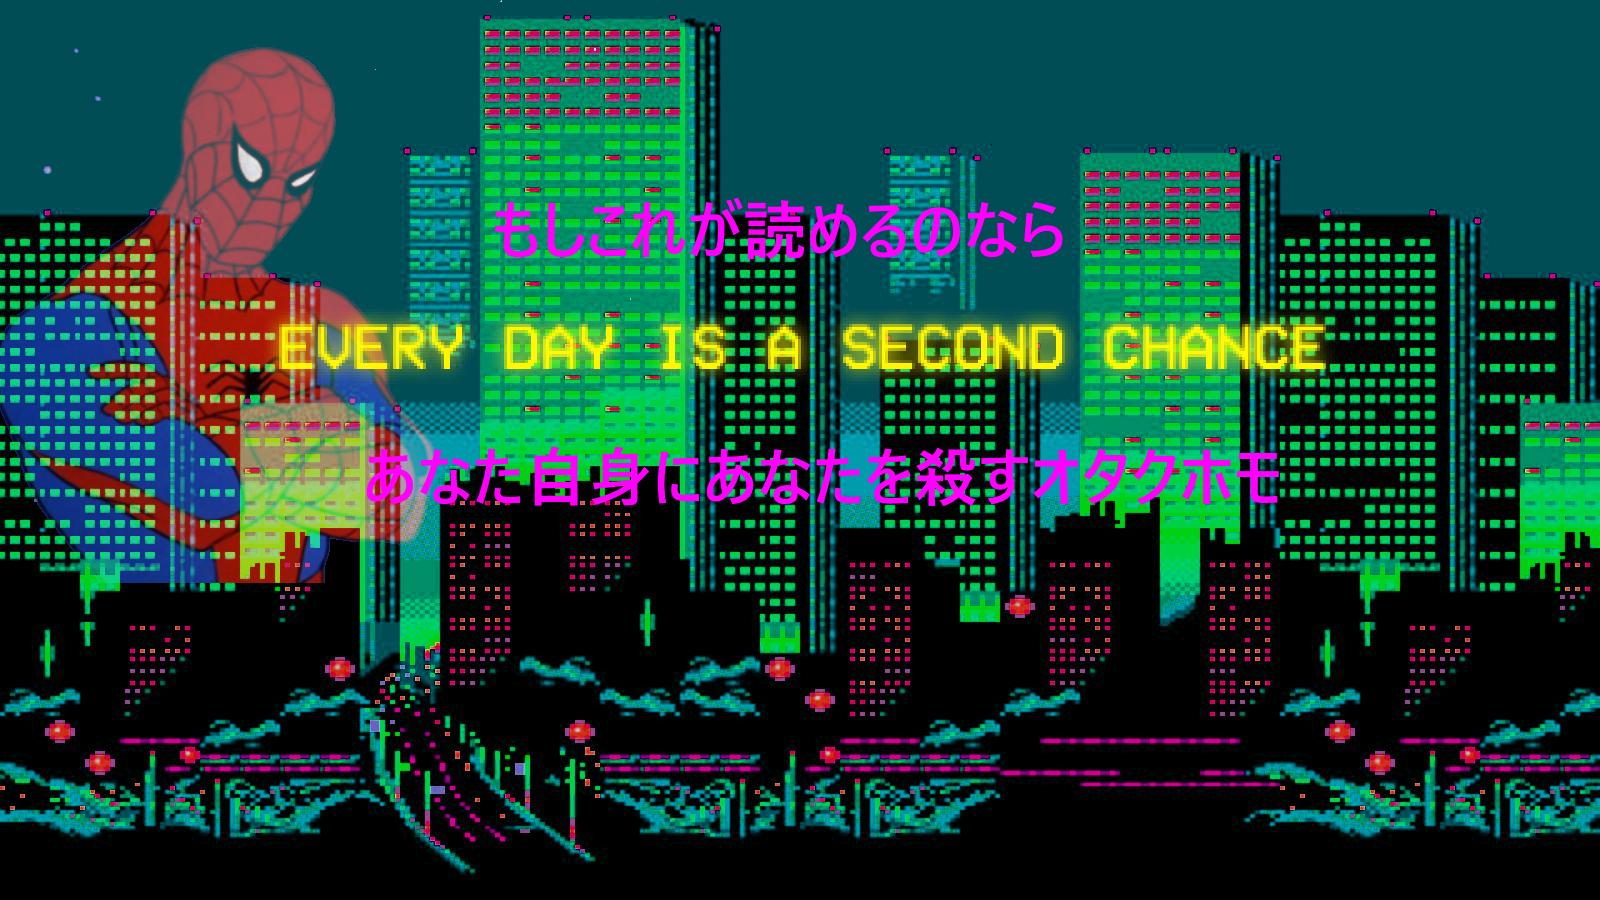 Vaporwave Anime Wallpaper Posted By Ryan Johnson